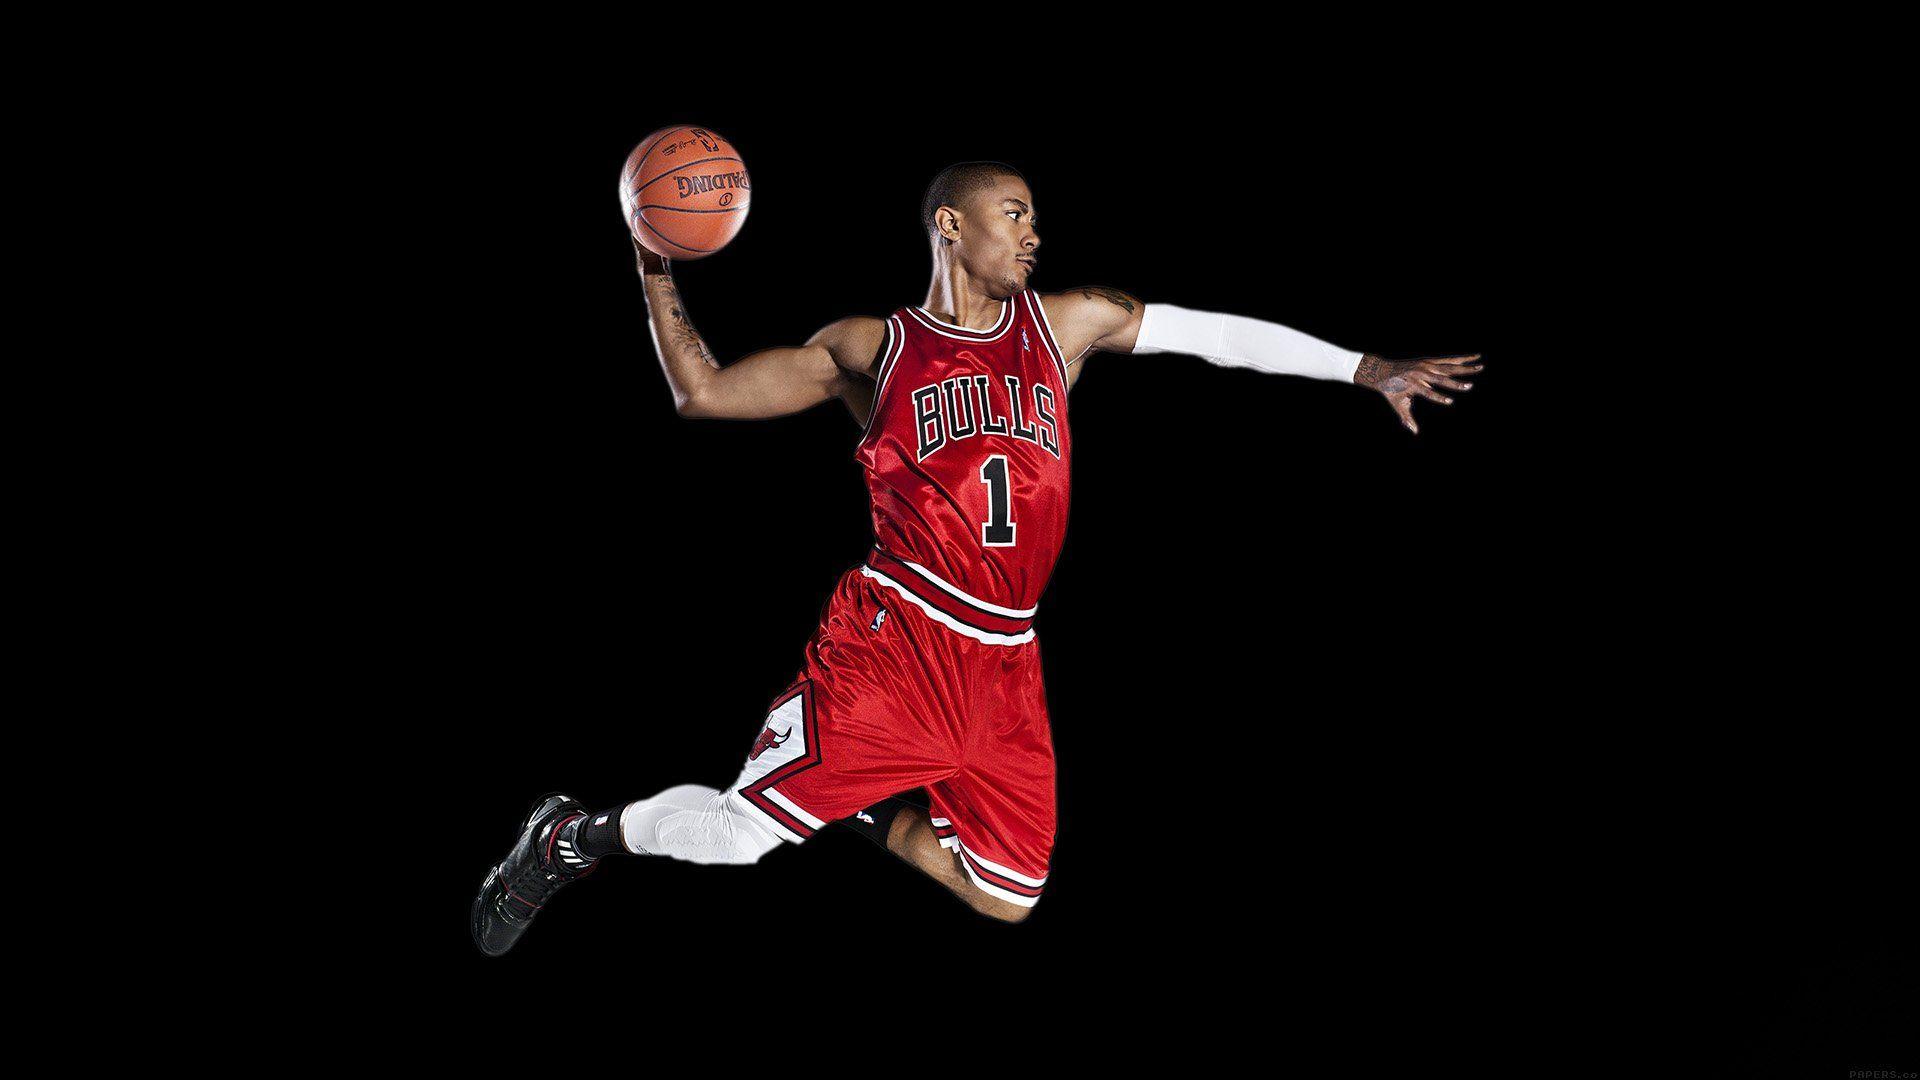 Kentucky Basketball 1080p